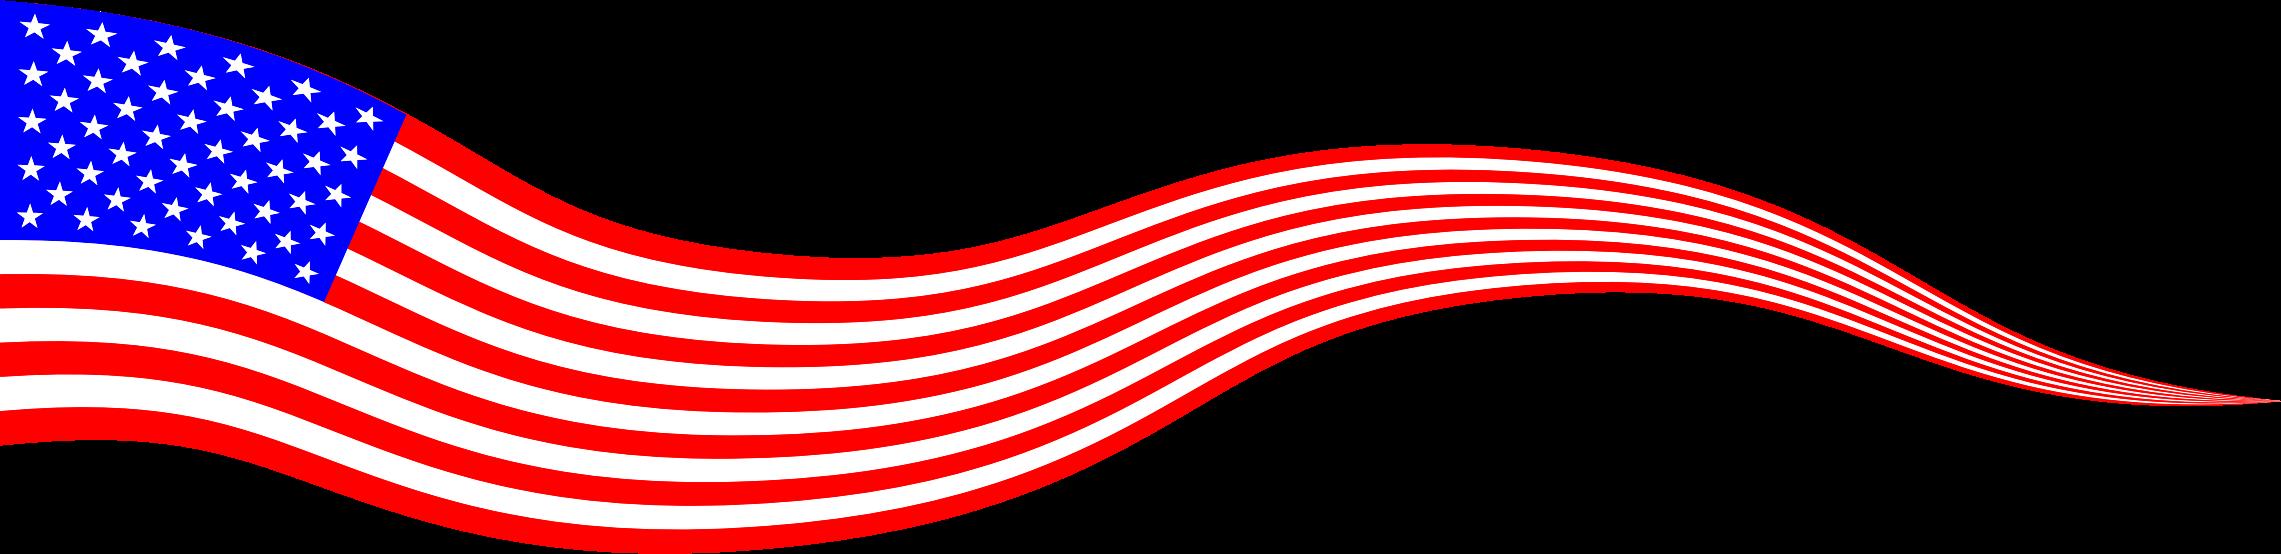 Wavy sun clipart banner free library Wavy USA Flag Banner by @GDJ, Wavy USA Flag Banner, on @openclipart ... banner free library